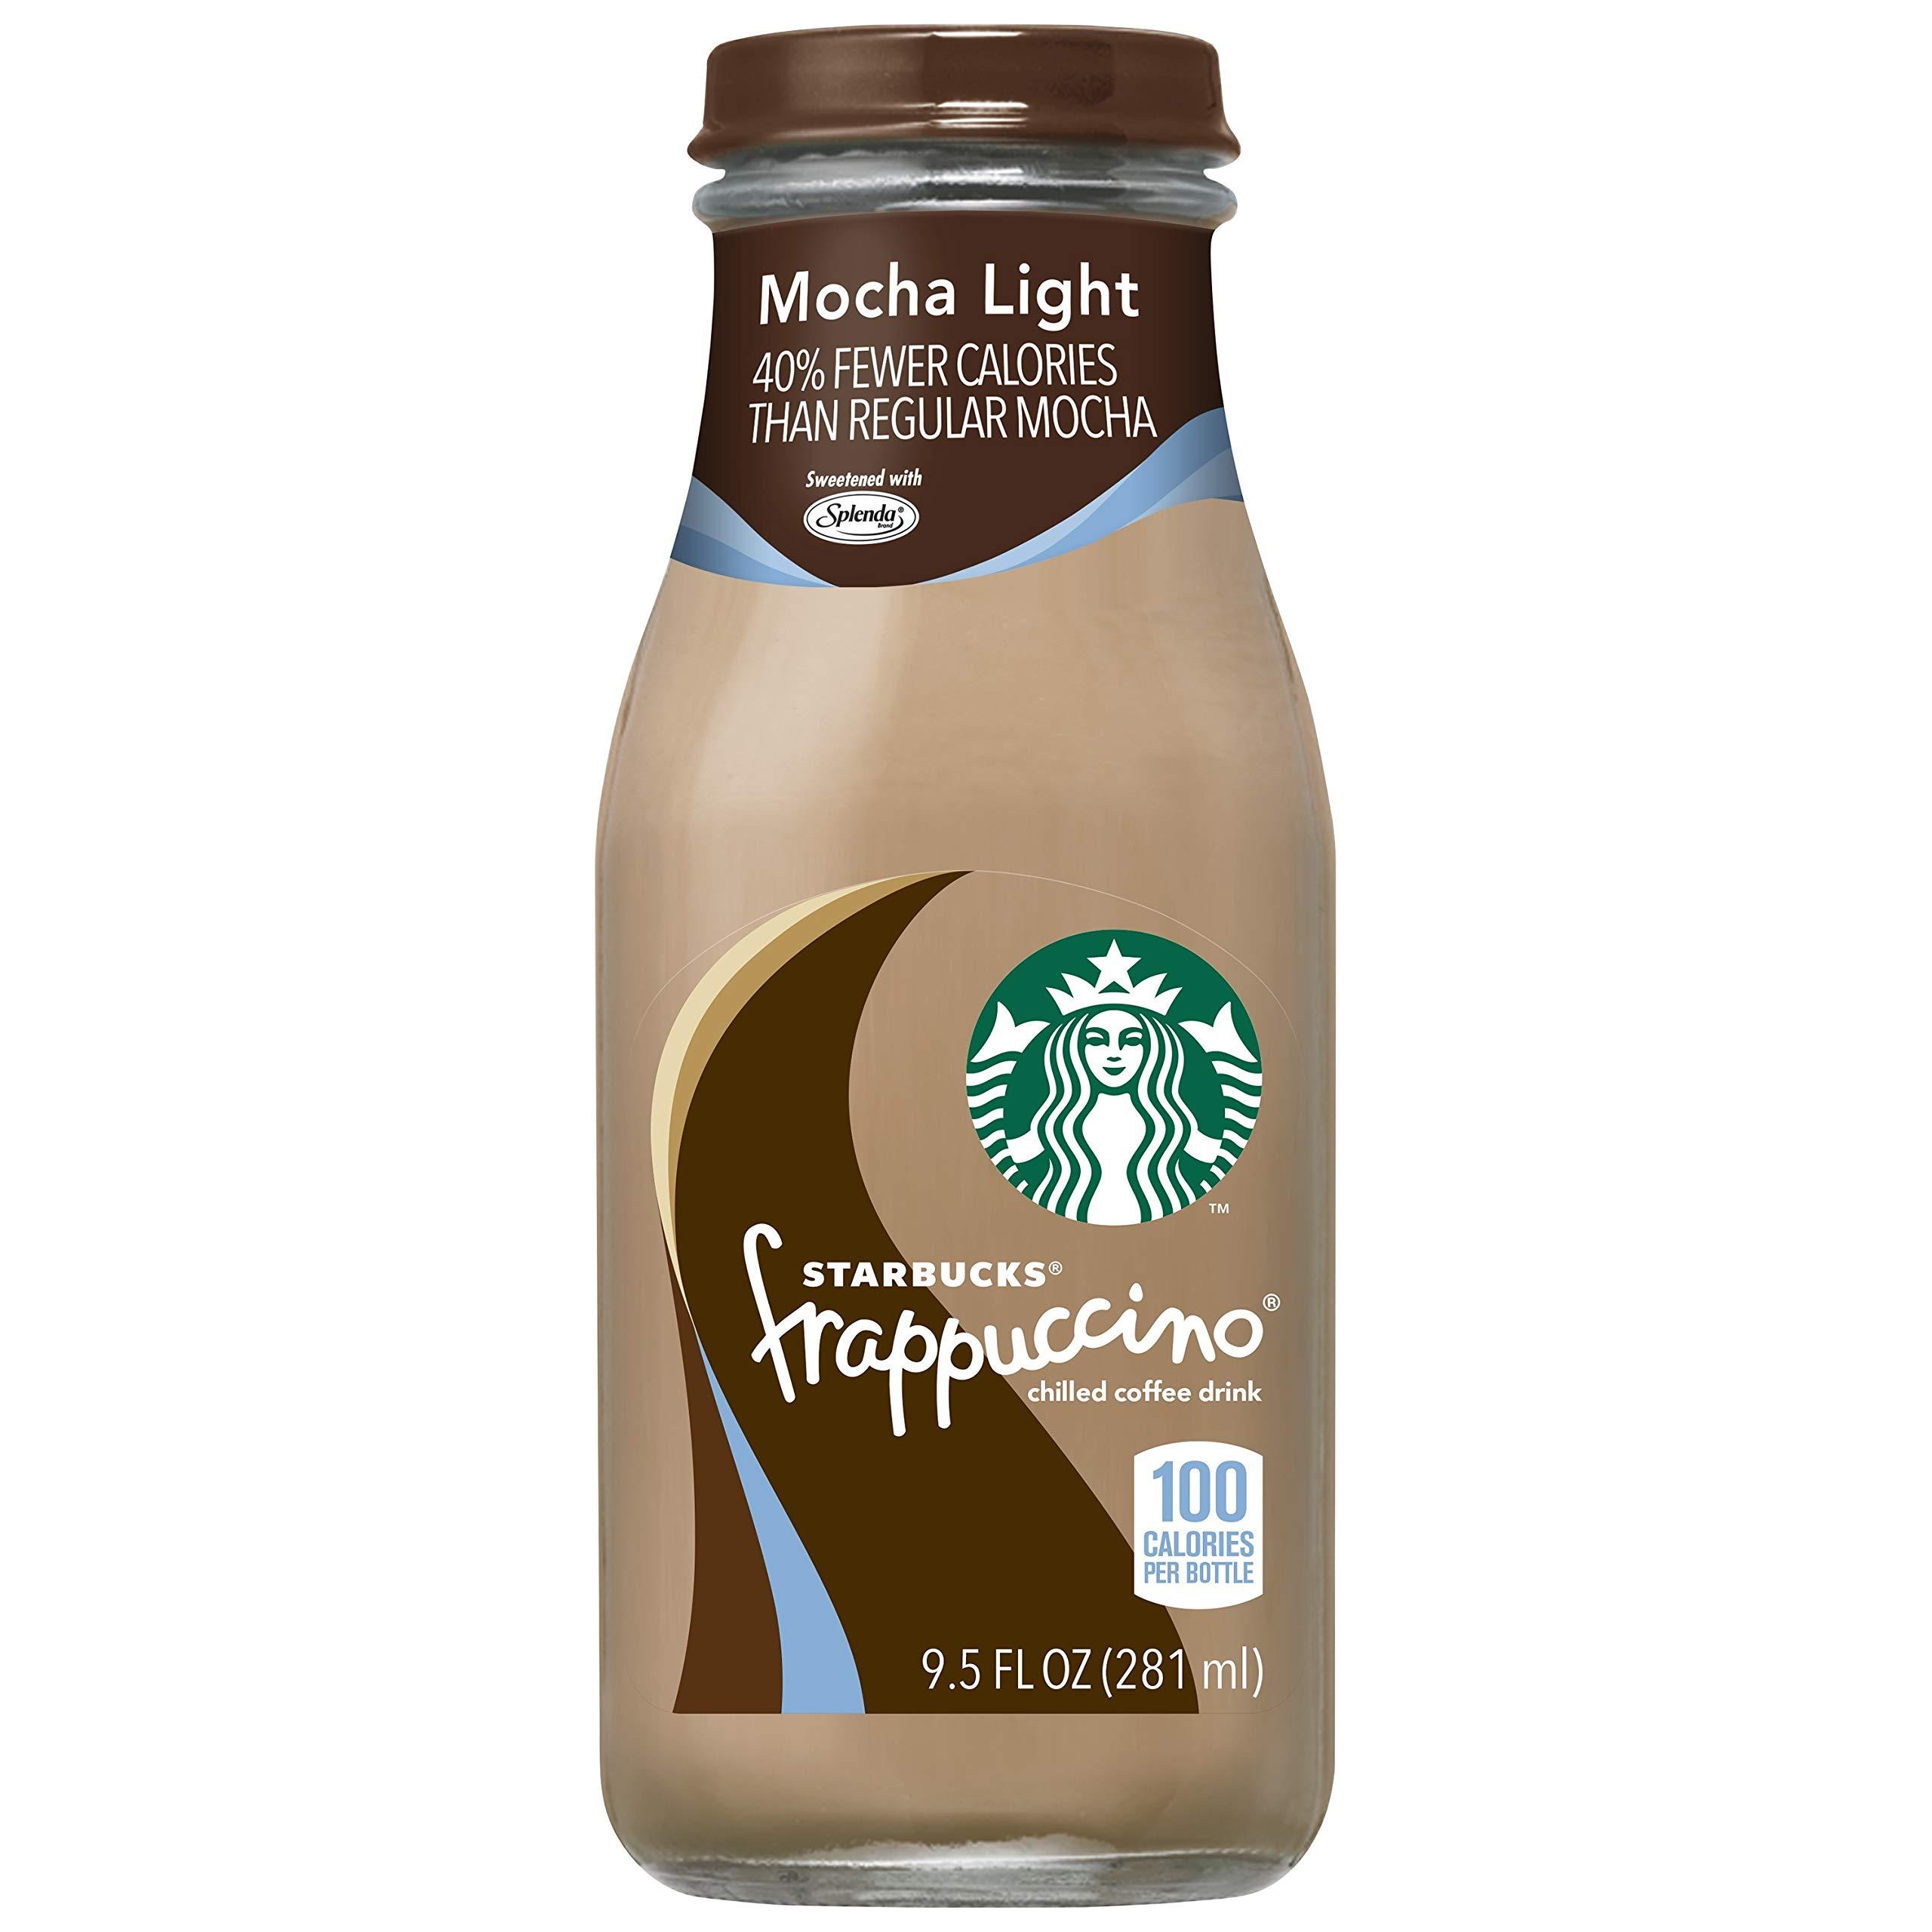 Starbucks Frappuccino, Mocha Light, 9.5oz Bottles, 15Count